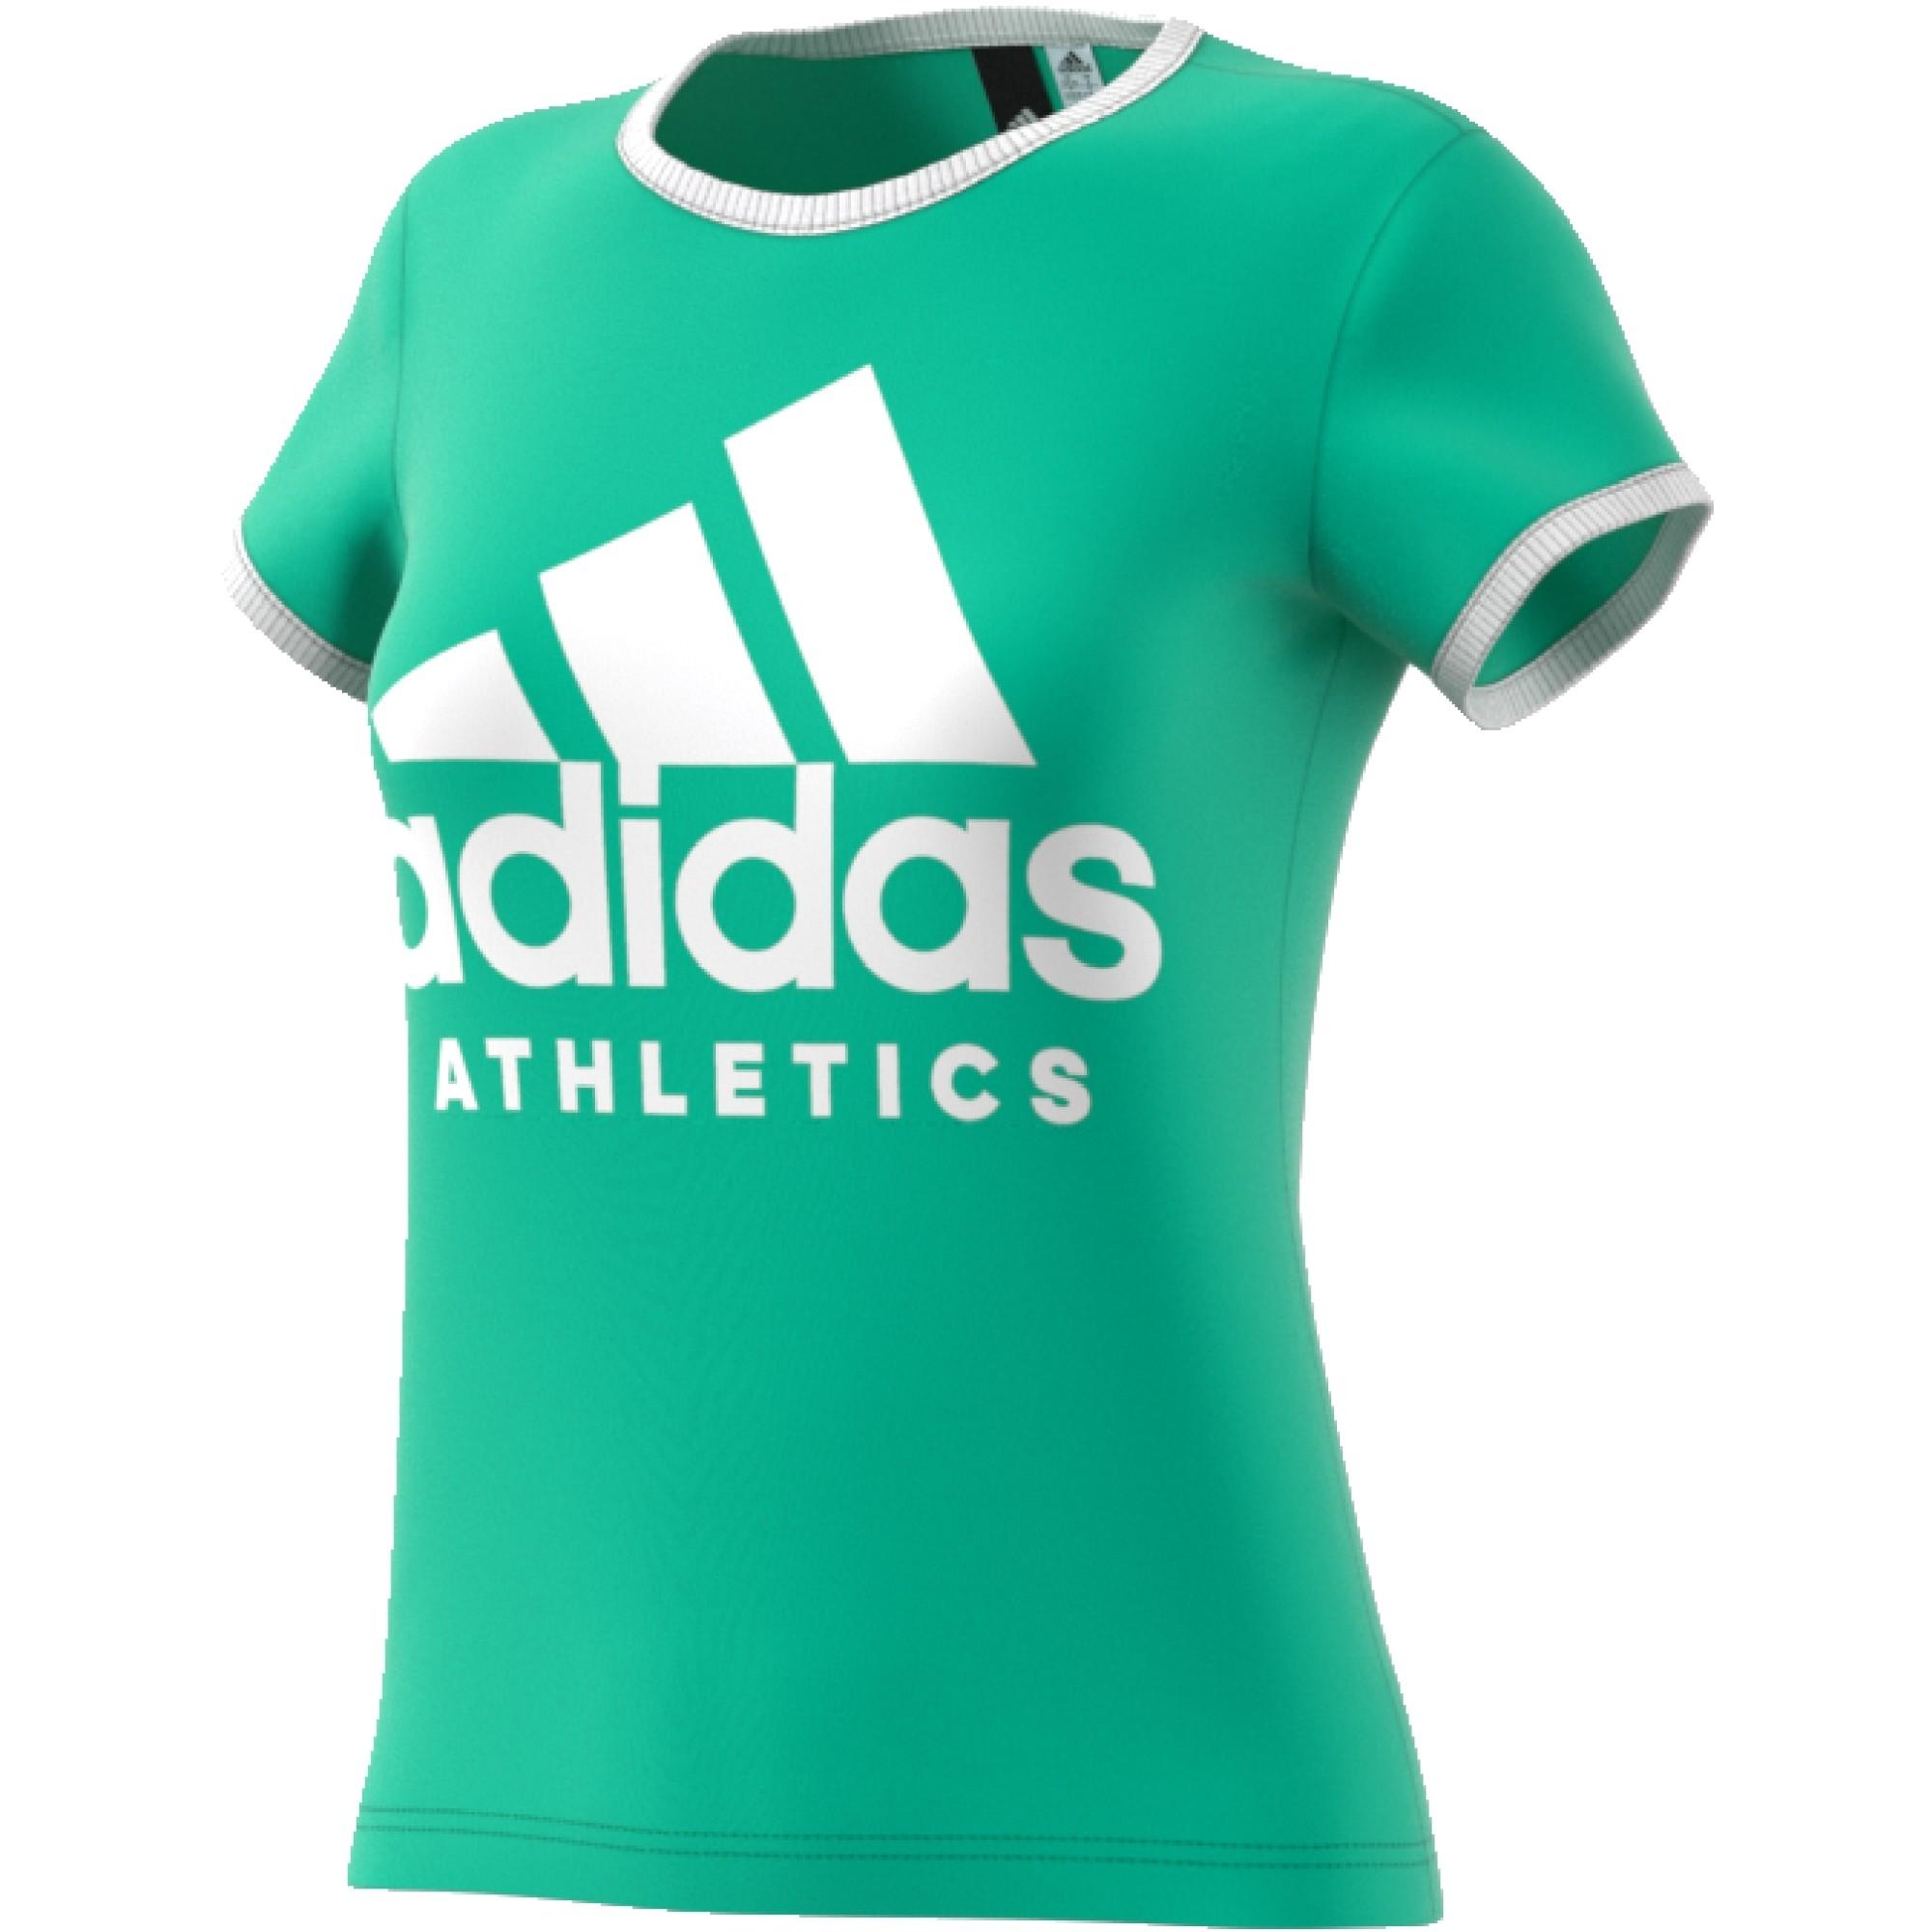 maillot adidas femme